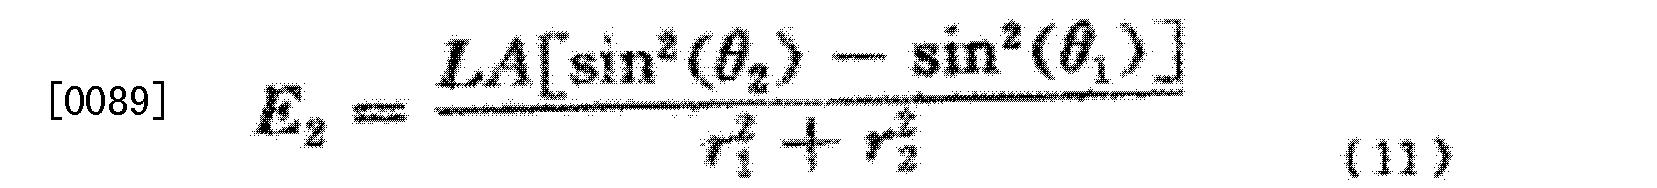 Figure CN104169776AD00083